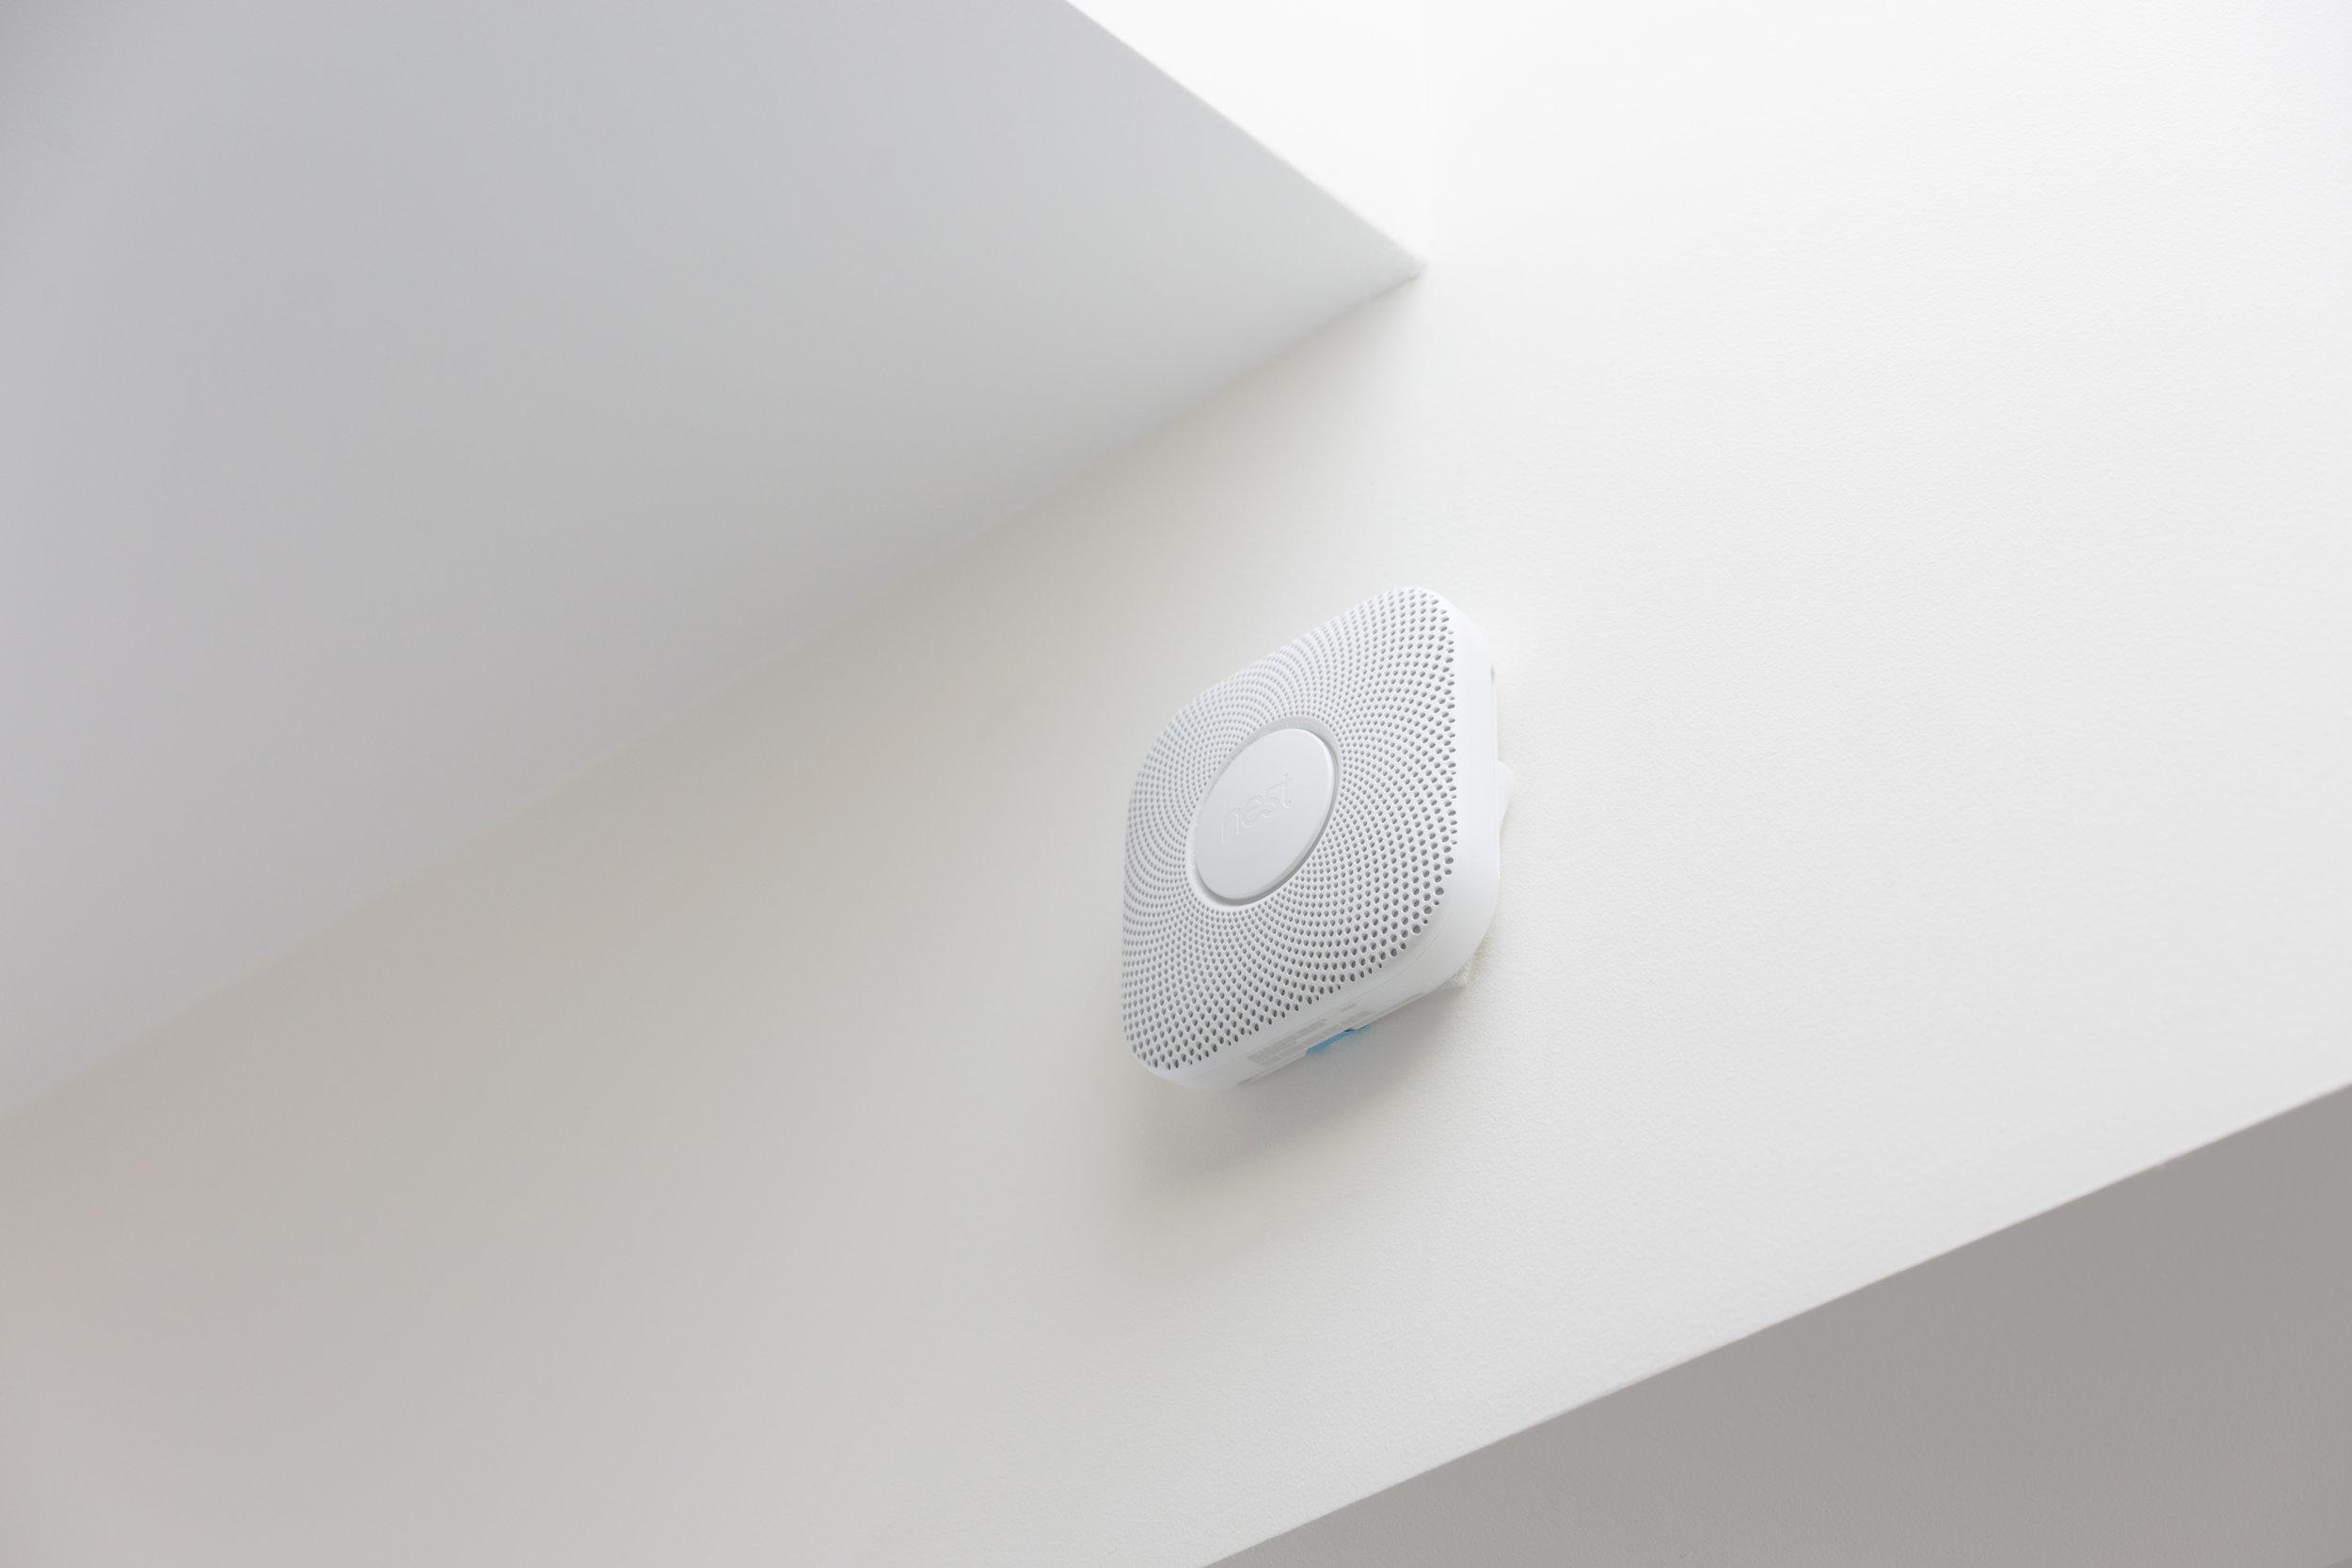 Nest_home_Nopa_protect_2_11534_v03 copy 2.jpg